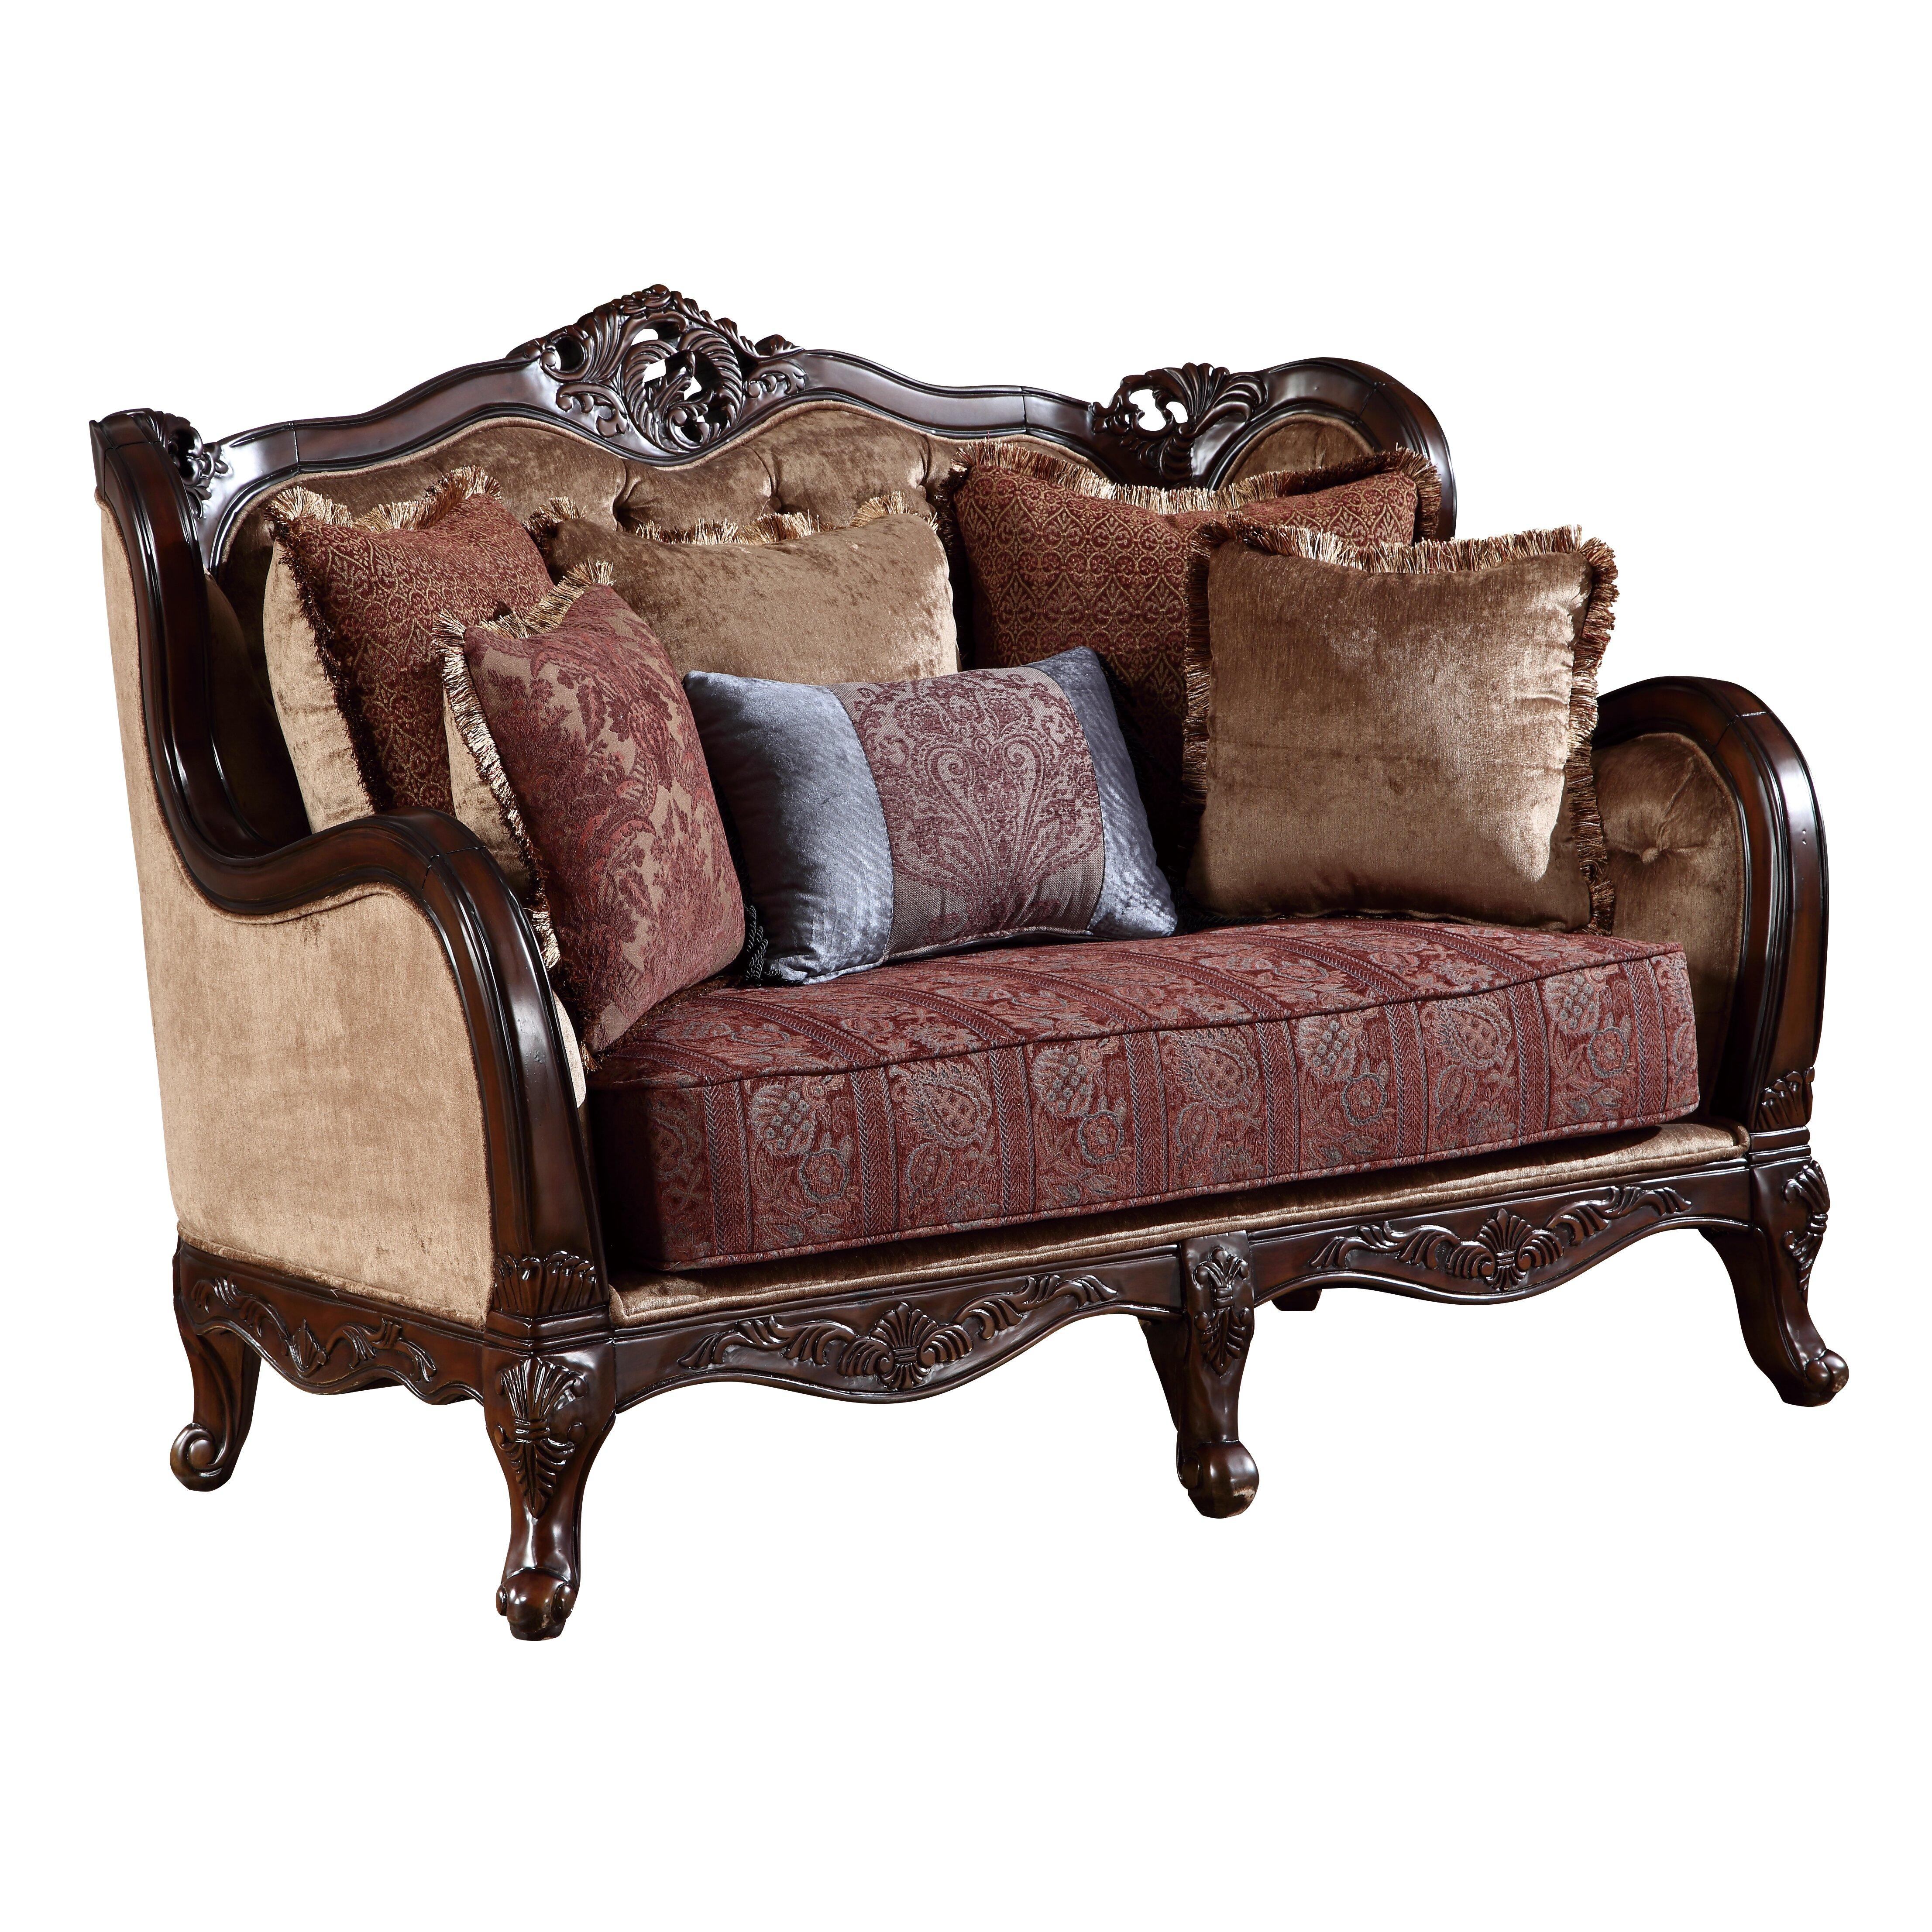 Global furniture usa loveseat wayfair for Wayfair shop furniture